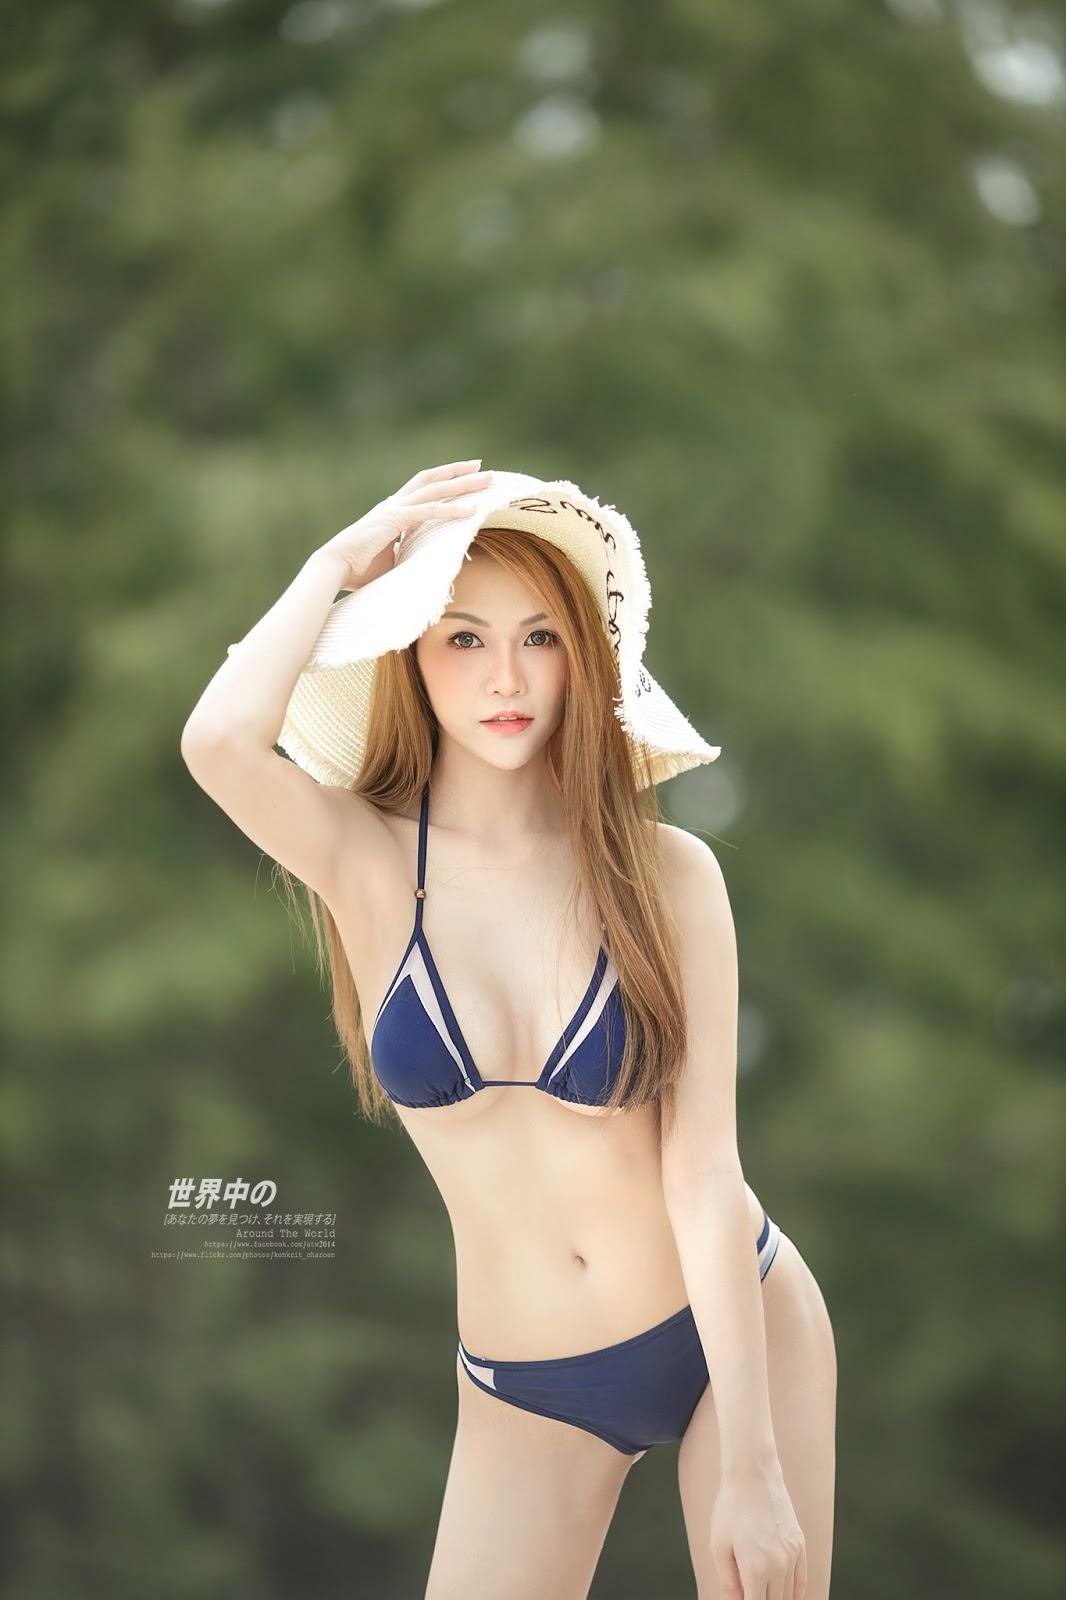 Thailand Beautyful Girl Pic No.252 || Saowalak Hanhiam